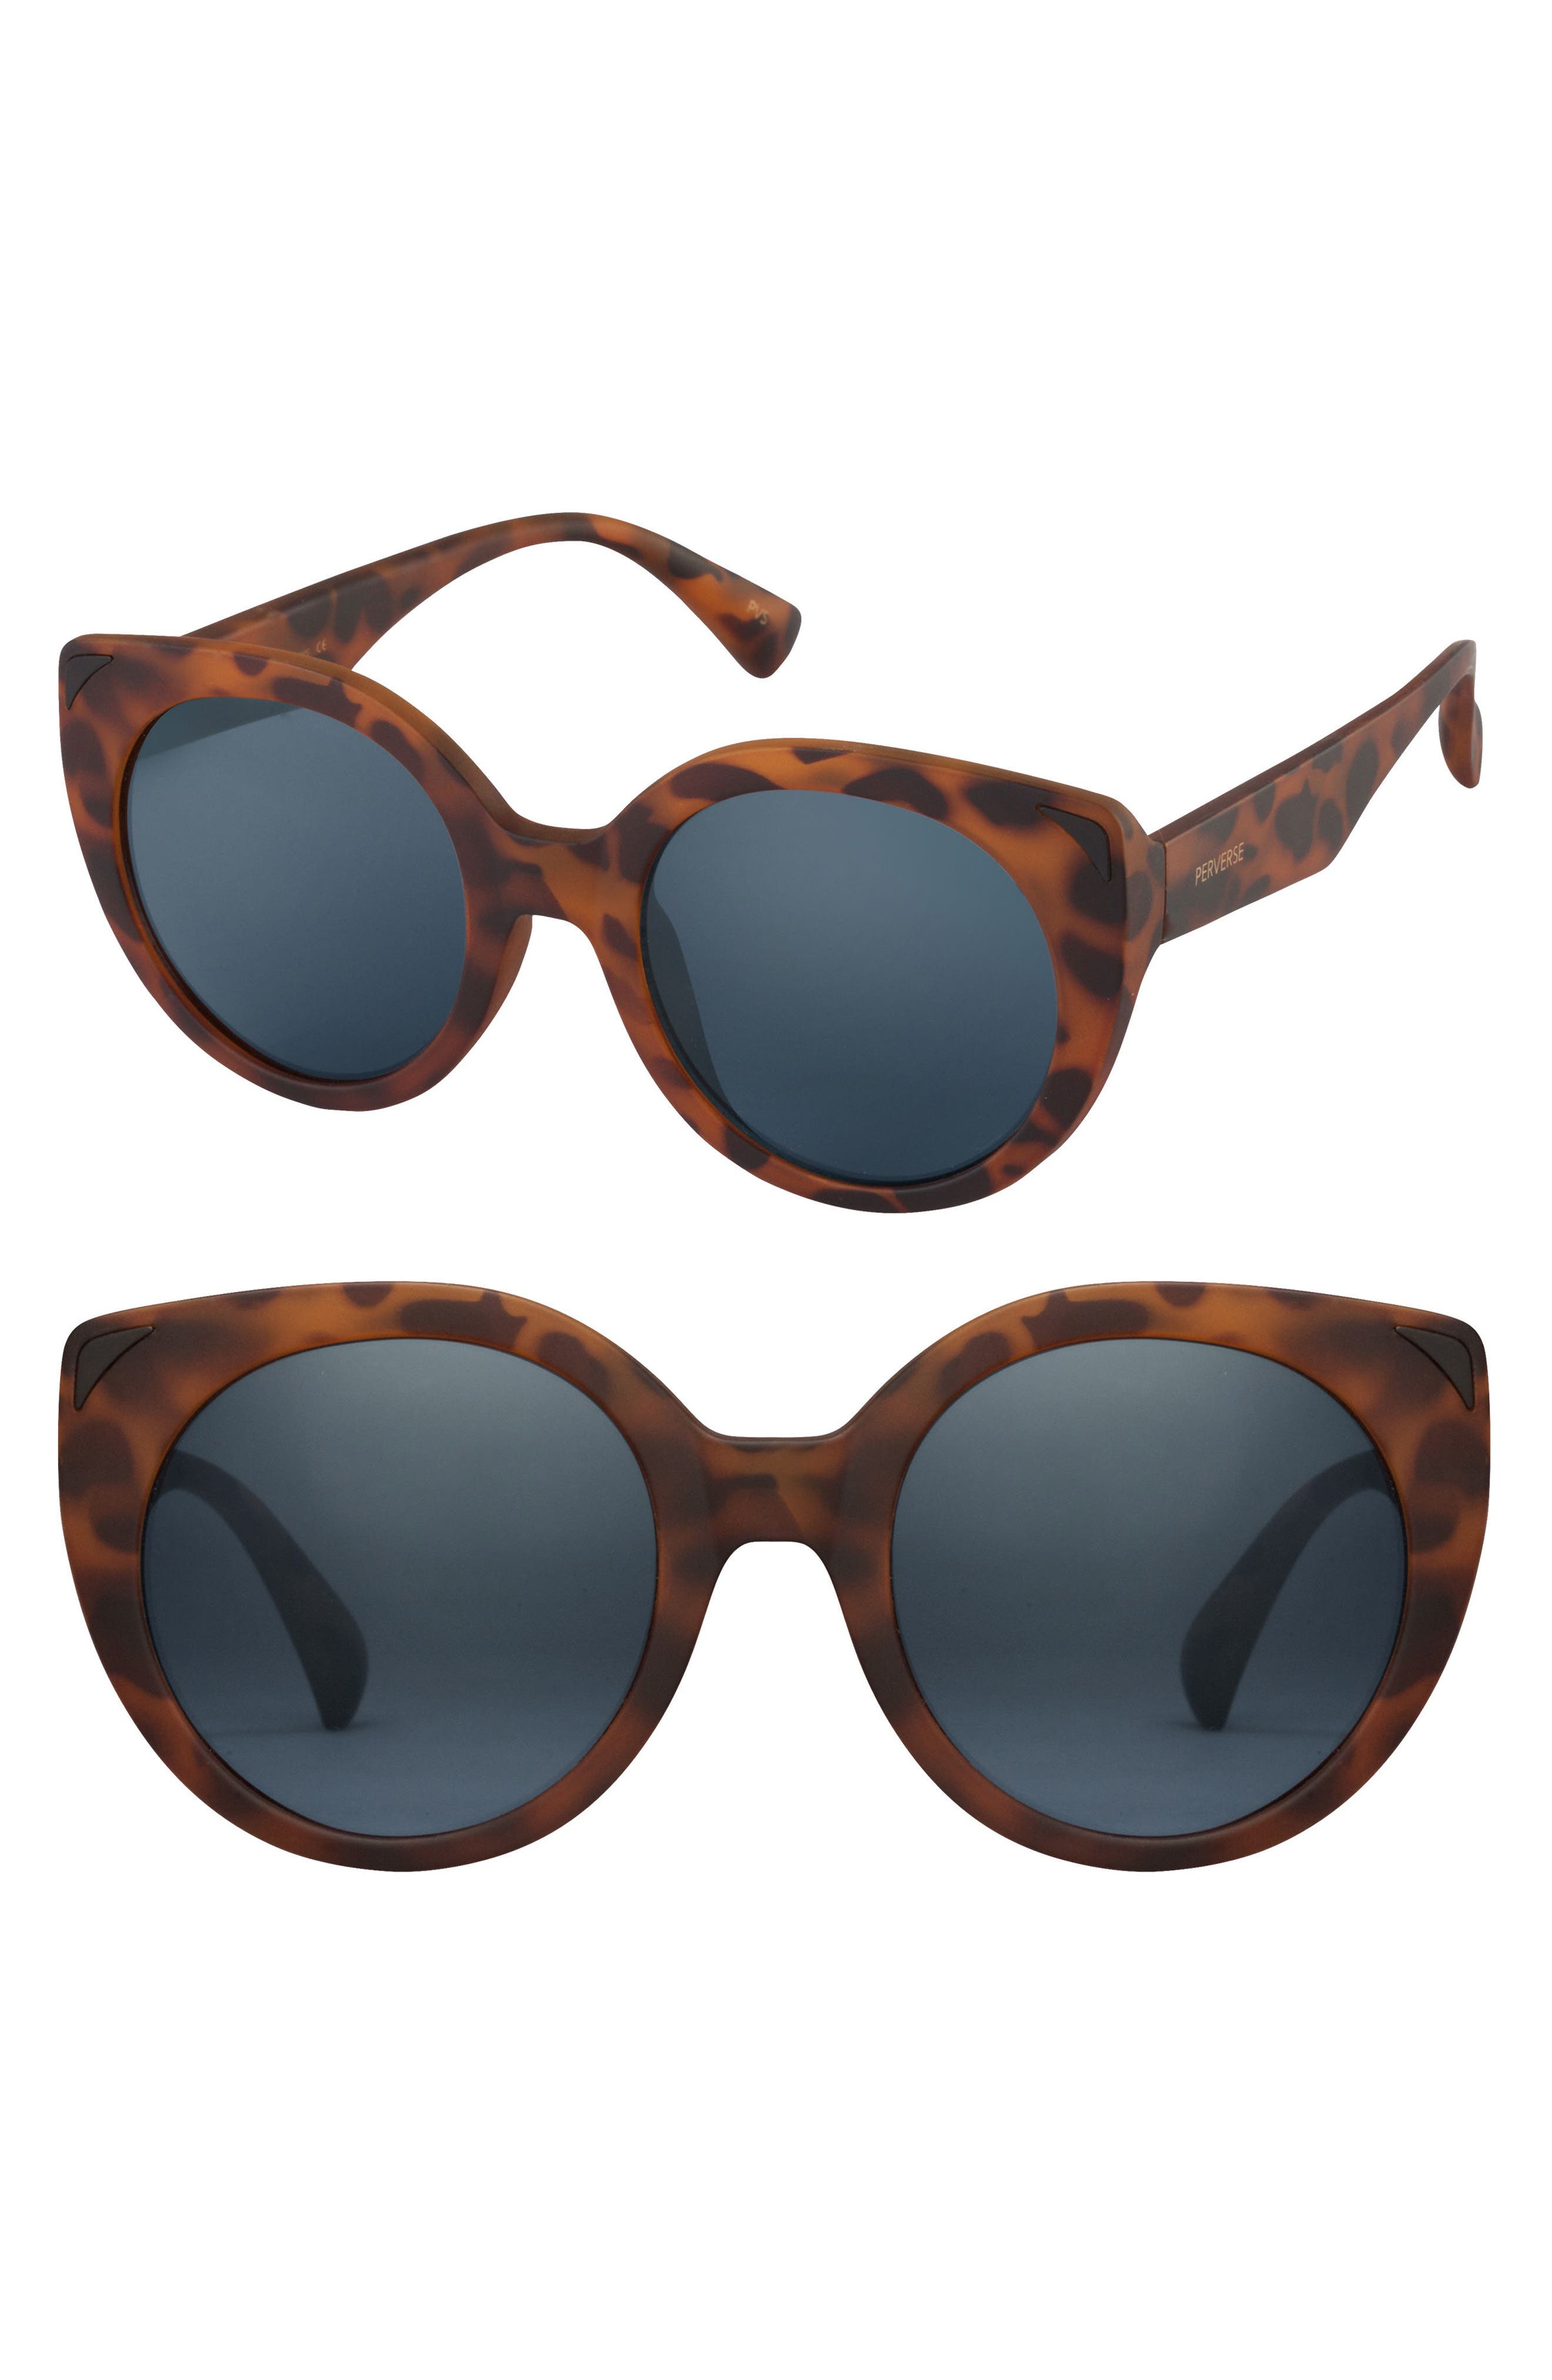 PERVERSE 49mm Feline Round Cat Eye Sunglasses